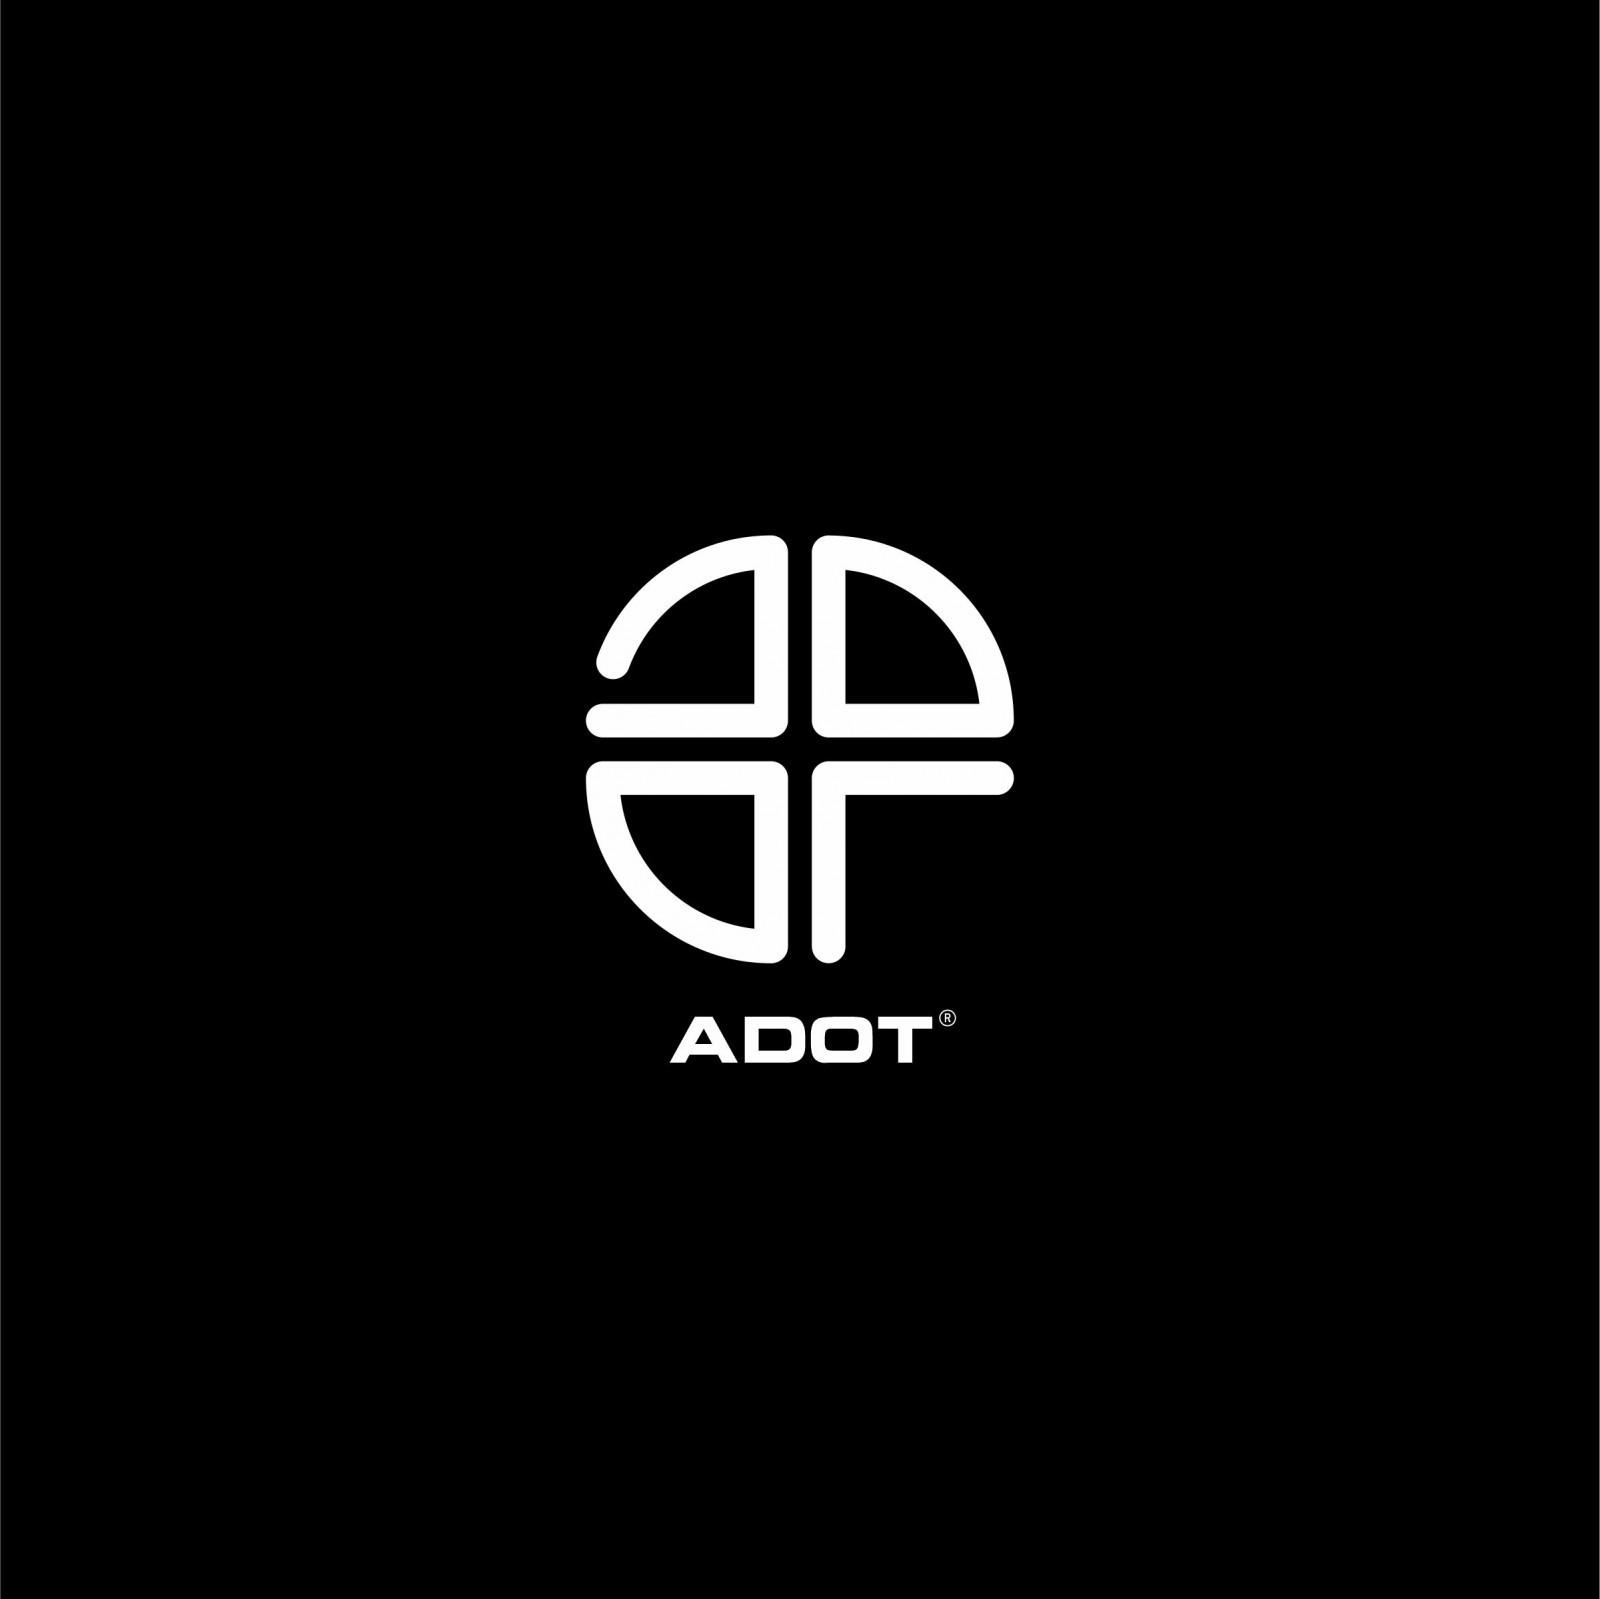 Hadexpete Creatives Creates New Brand Identity for Adot